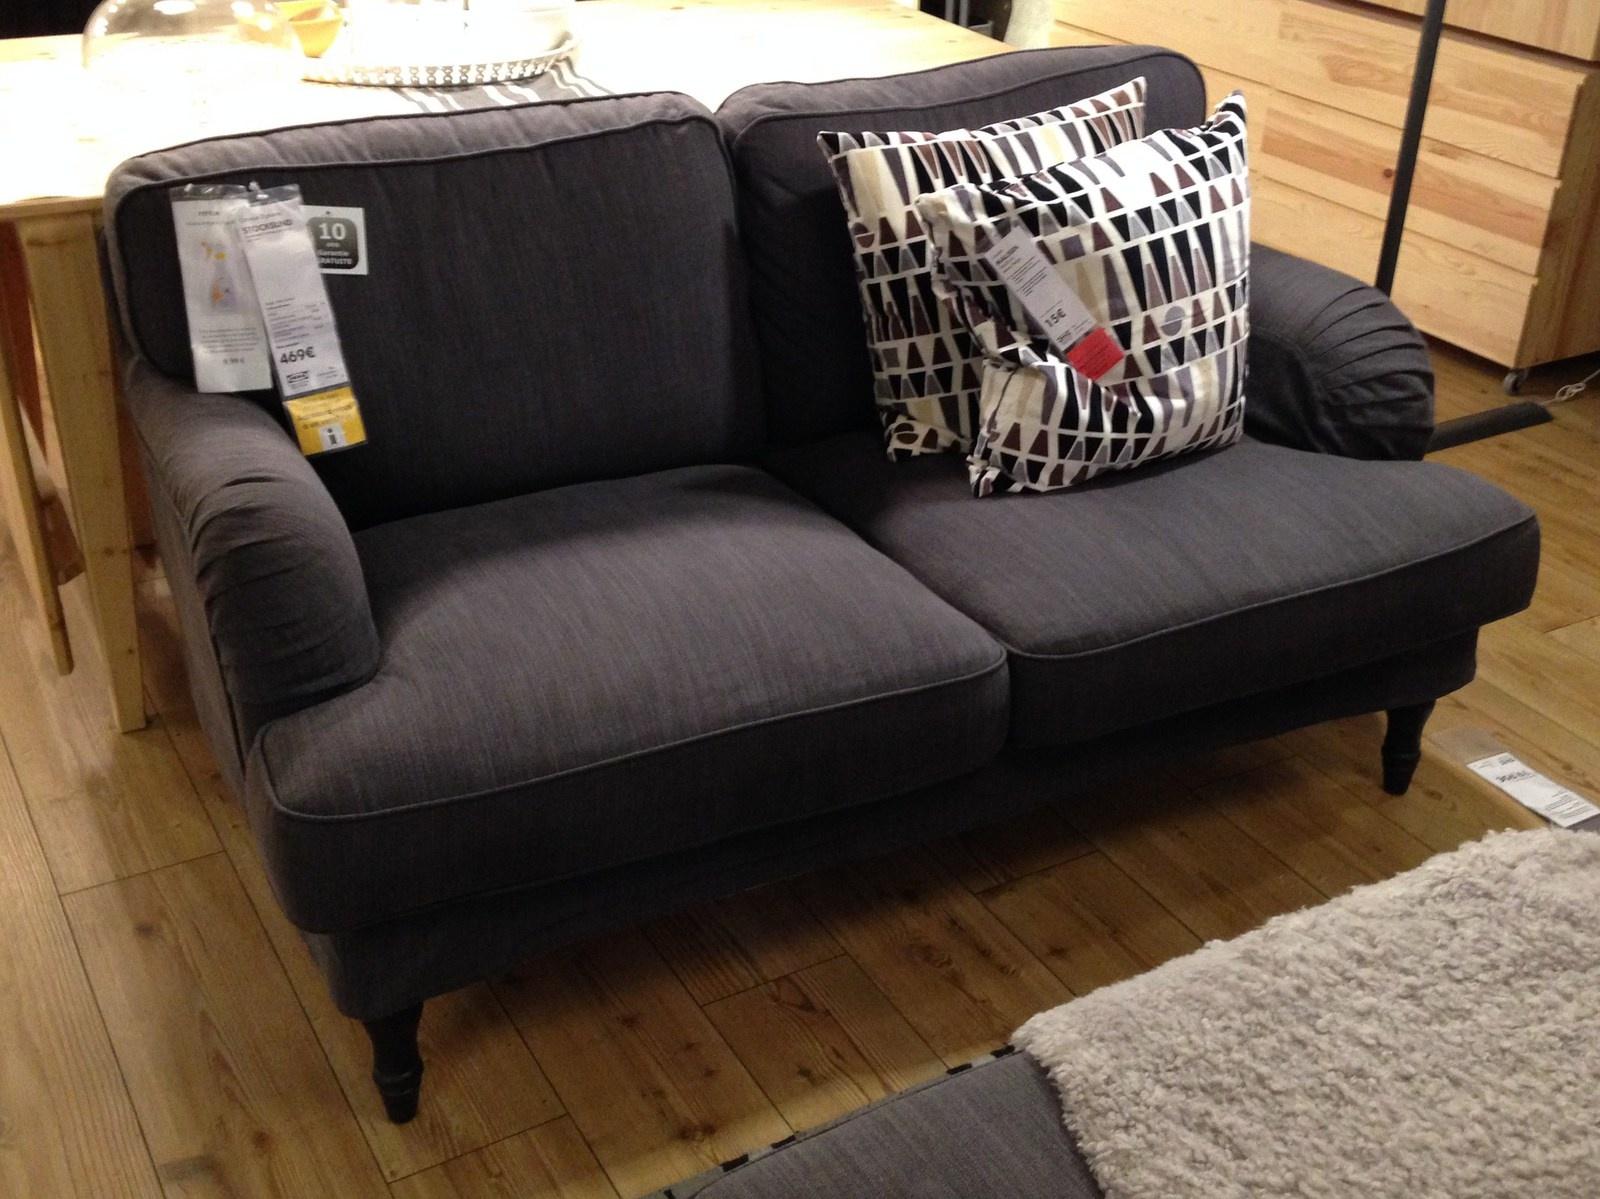 Canapé Convertible Ikea Occasion Inspirant Image Ikea Salon En Cuir